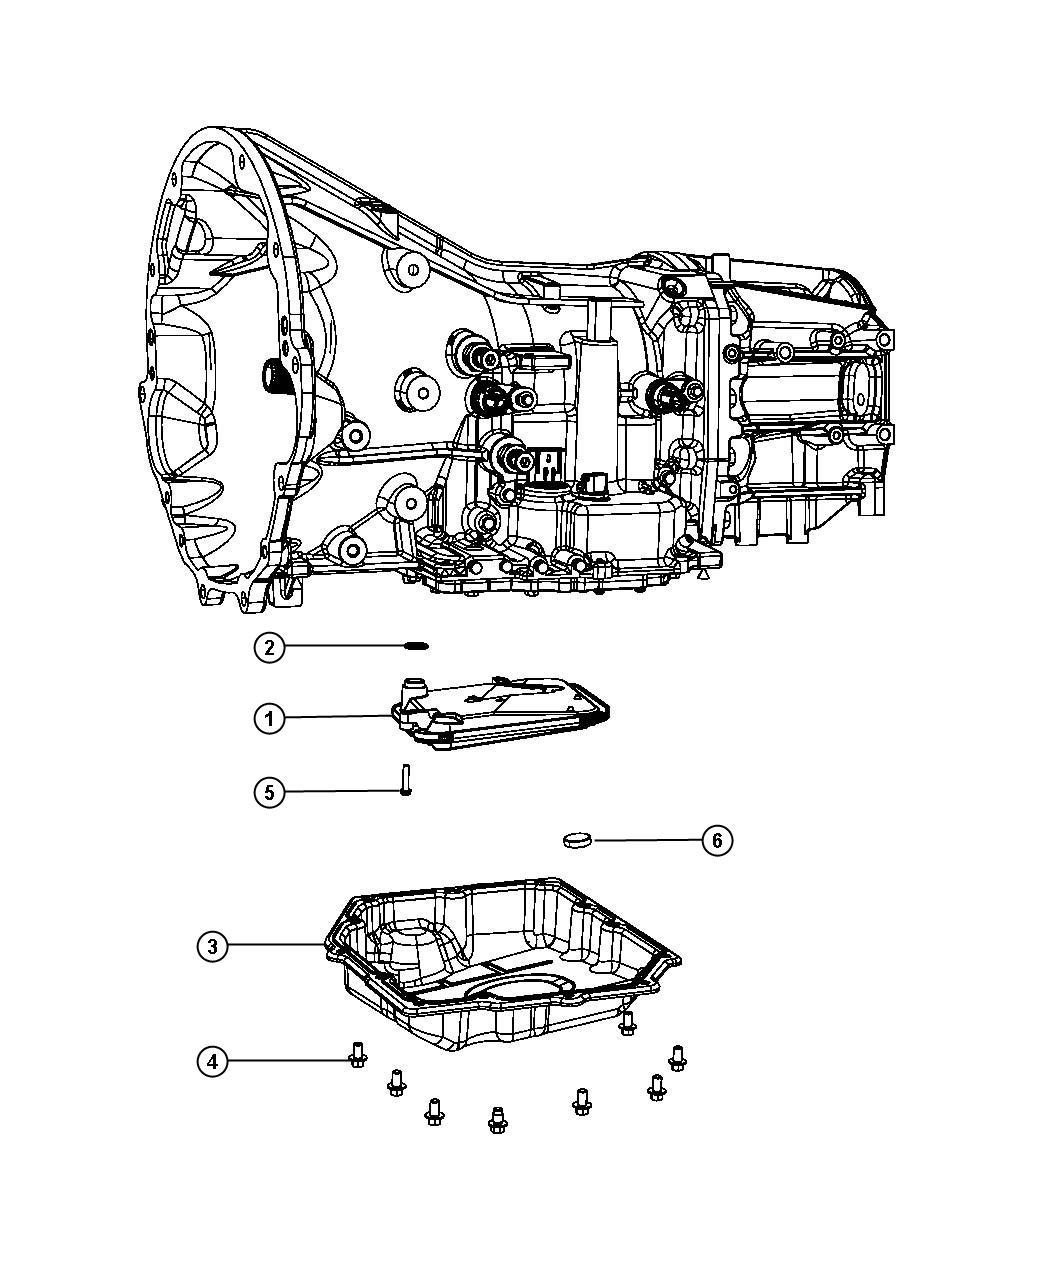 Jeep Wrangler Filter, filter kit. Transmission oil. Use